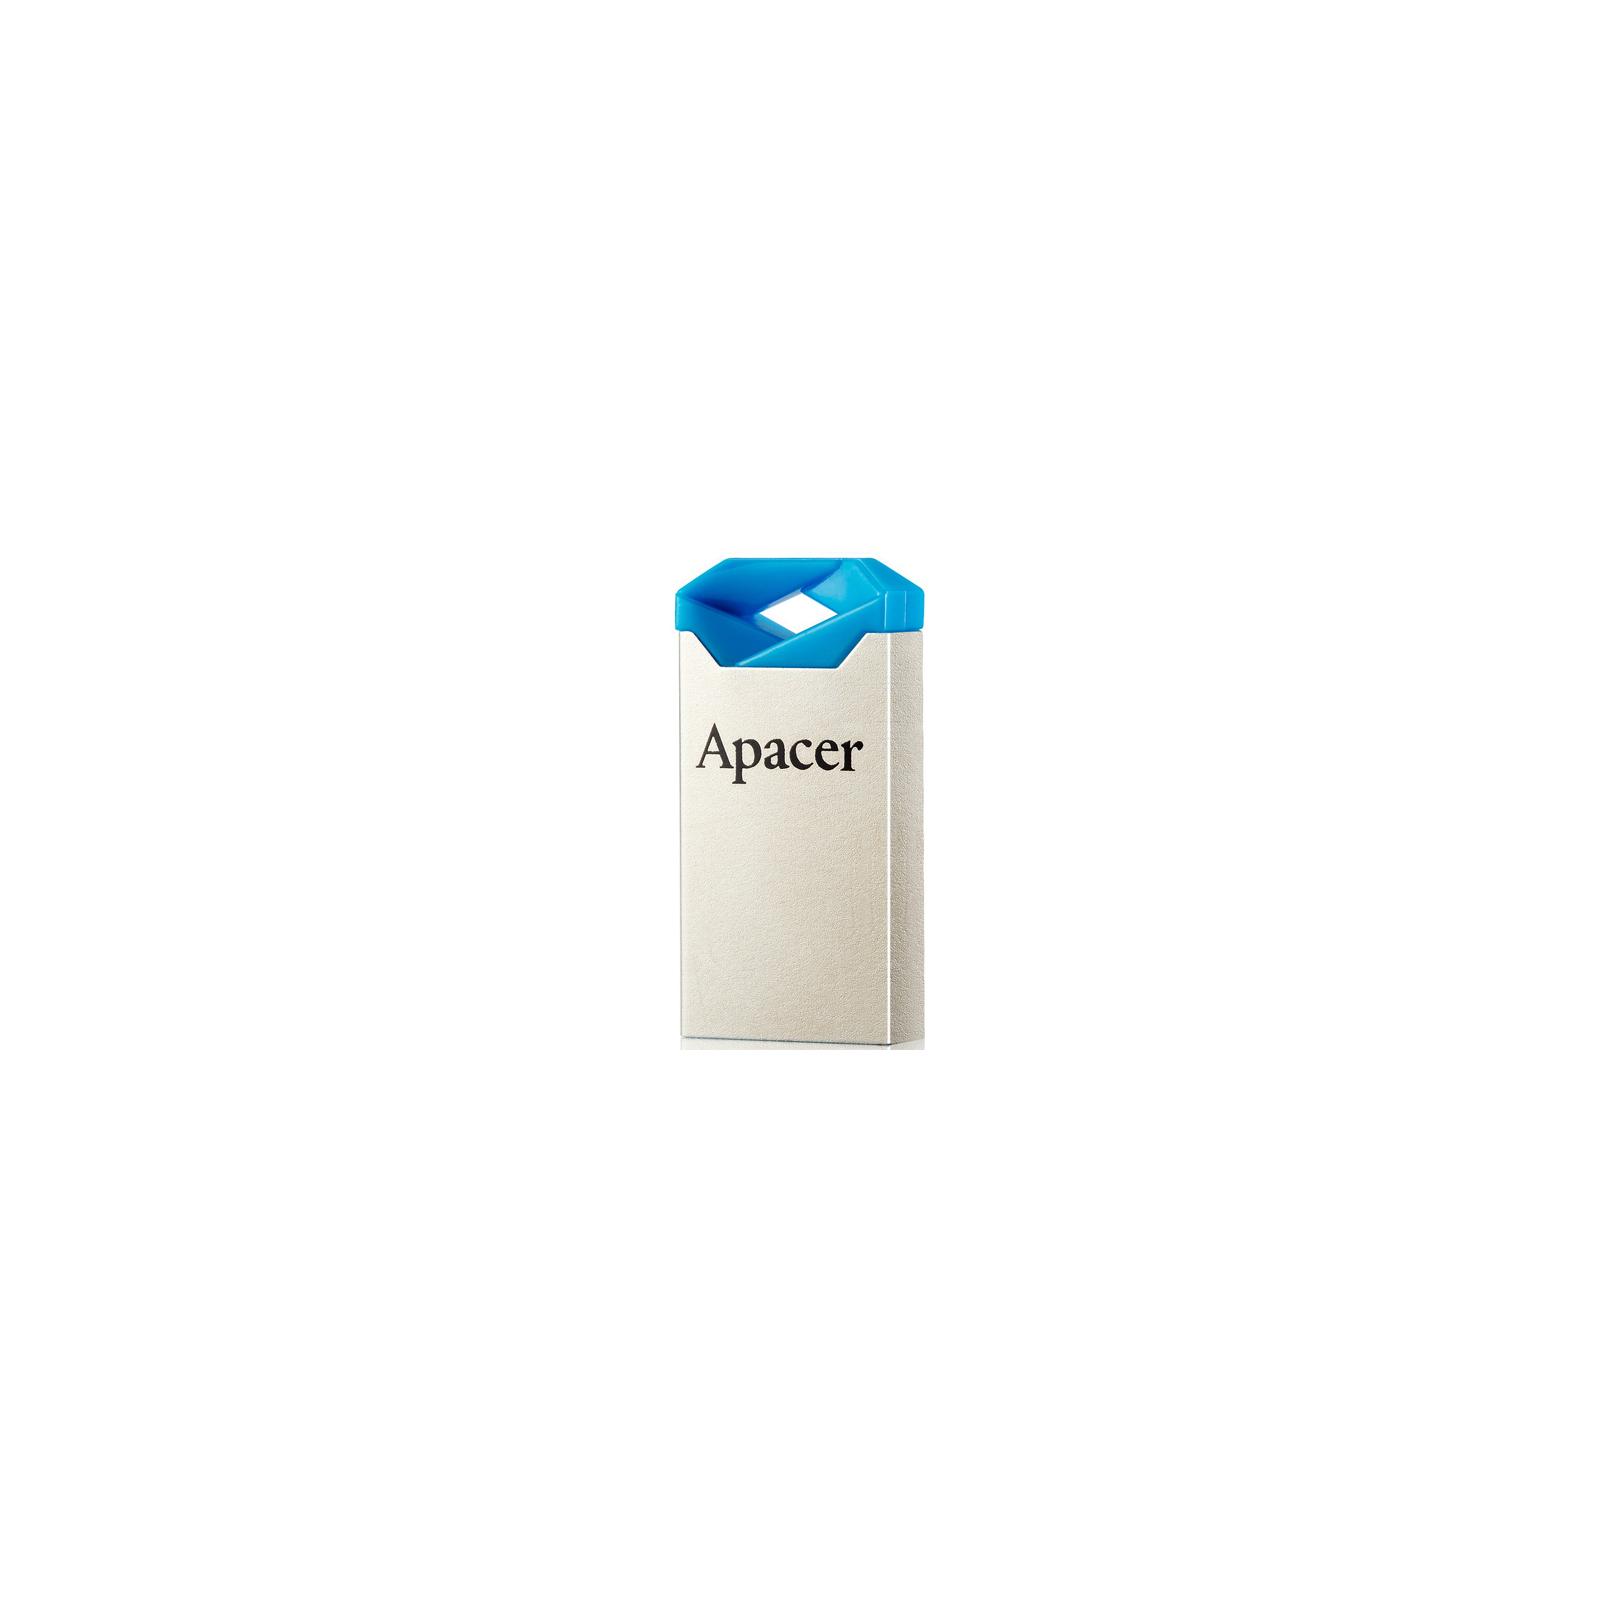 USB флеш накопитель 8GB AH111 Blue RP USB2.0 Apacer (AP8GAH111U-1) изображение 2